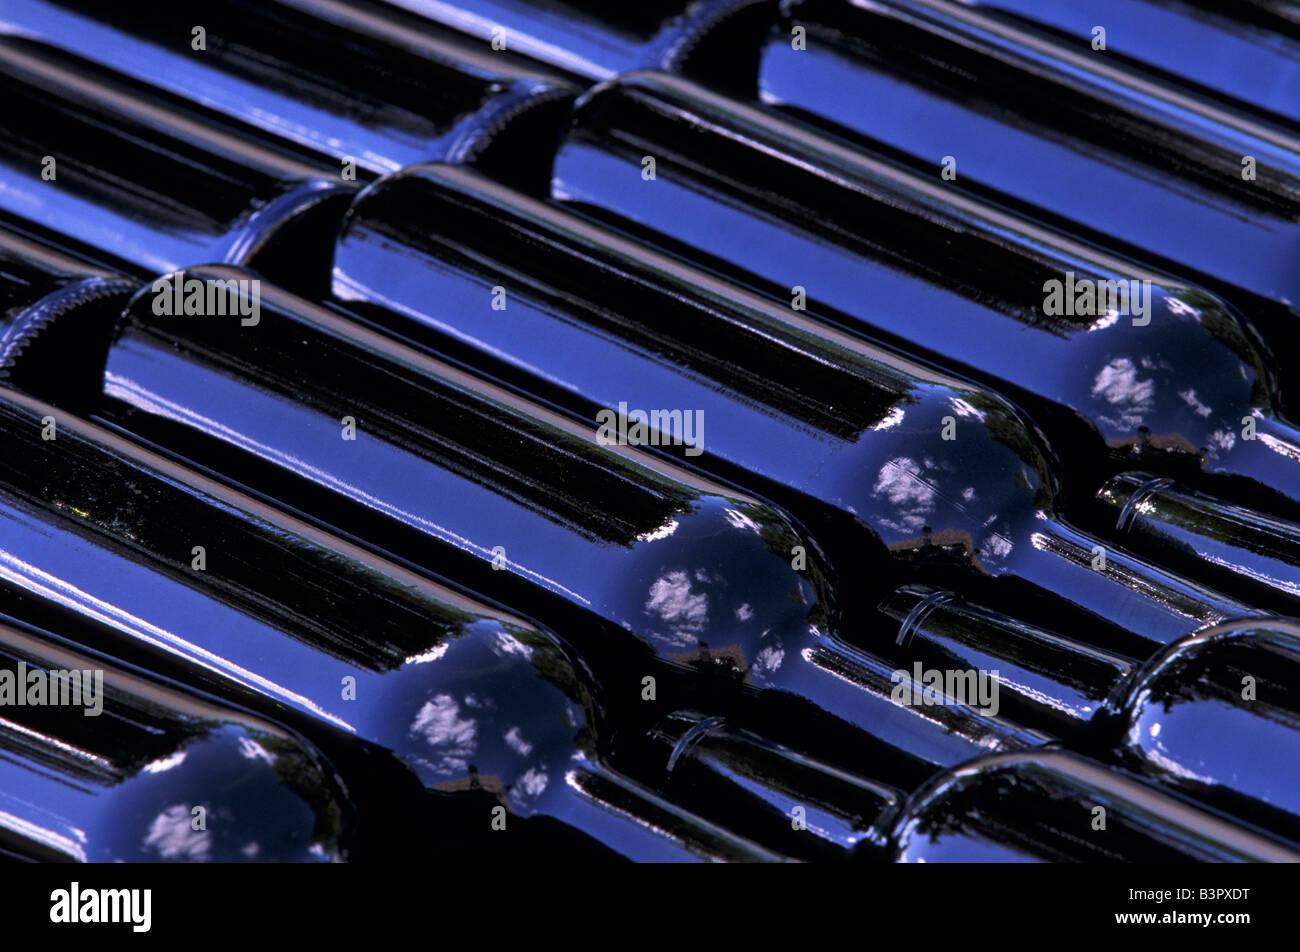 Botellas de vino Imagen De Stock